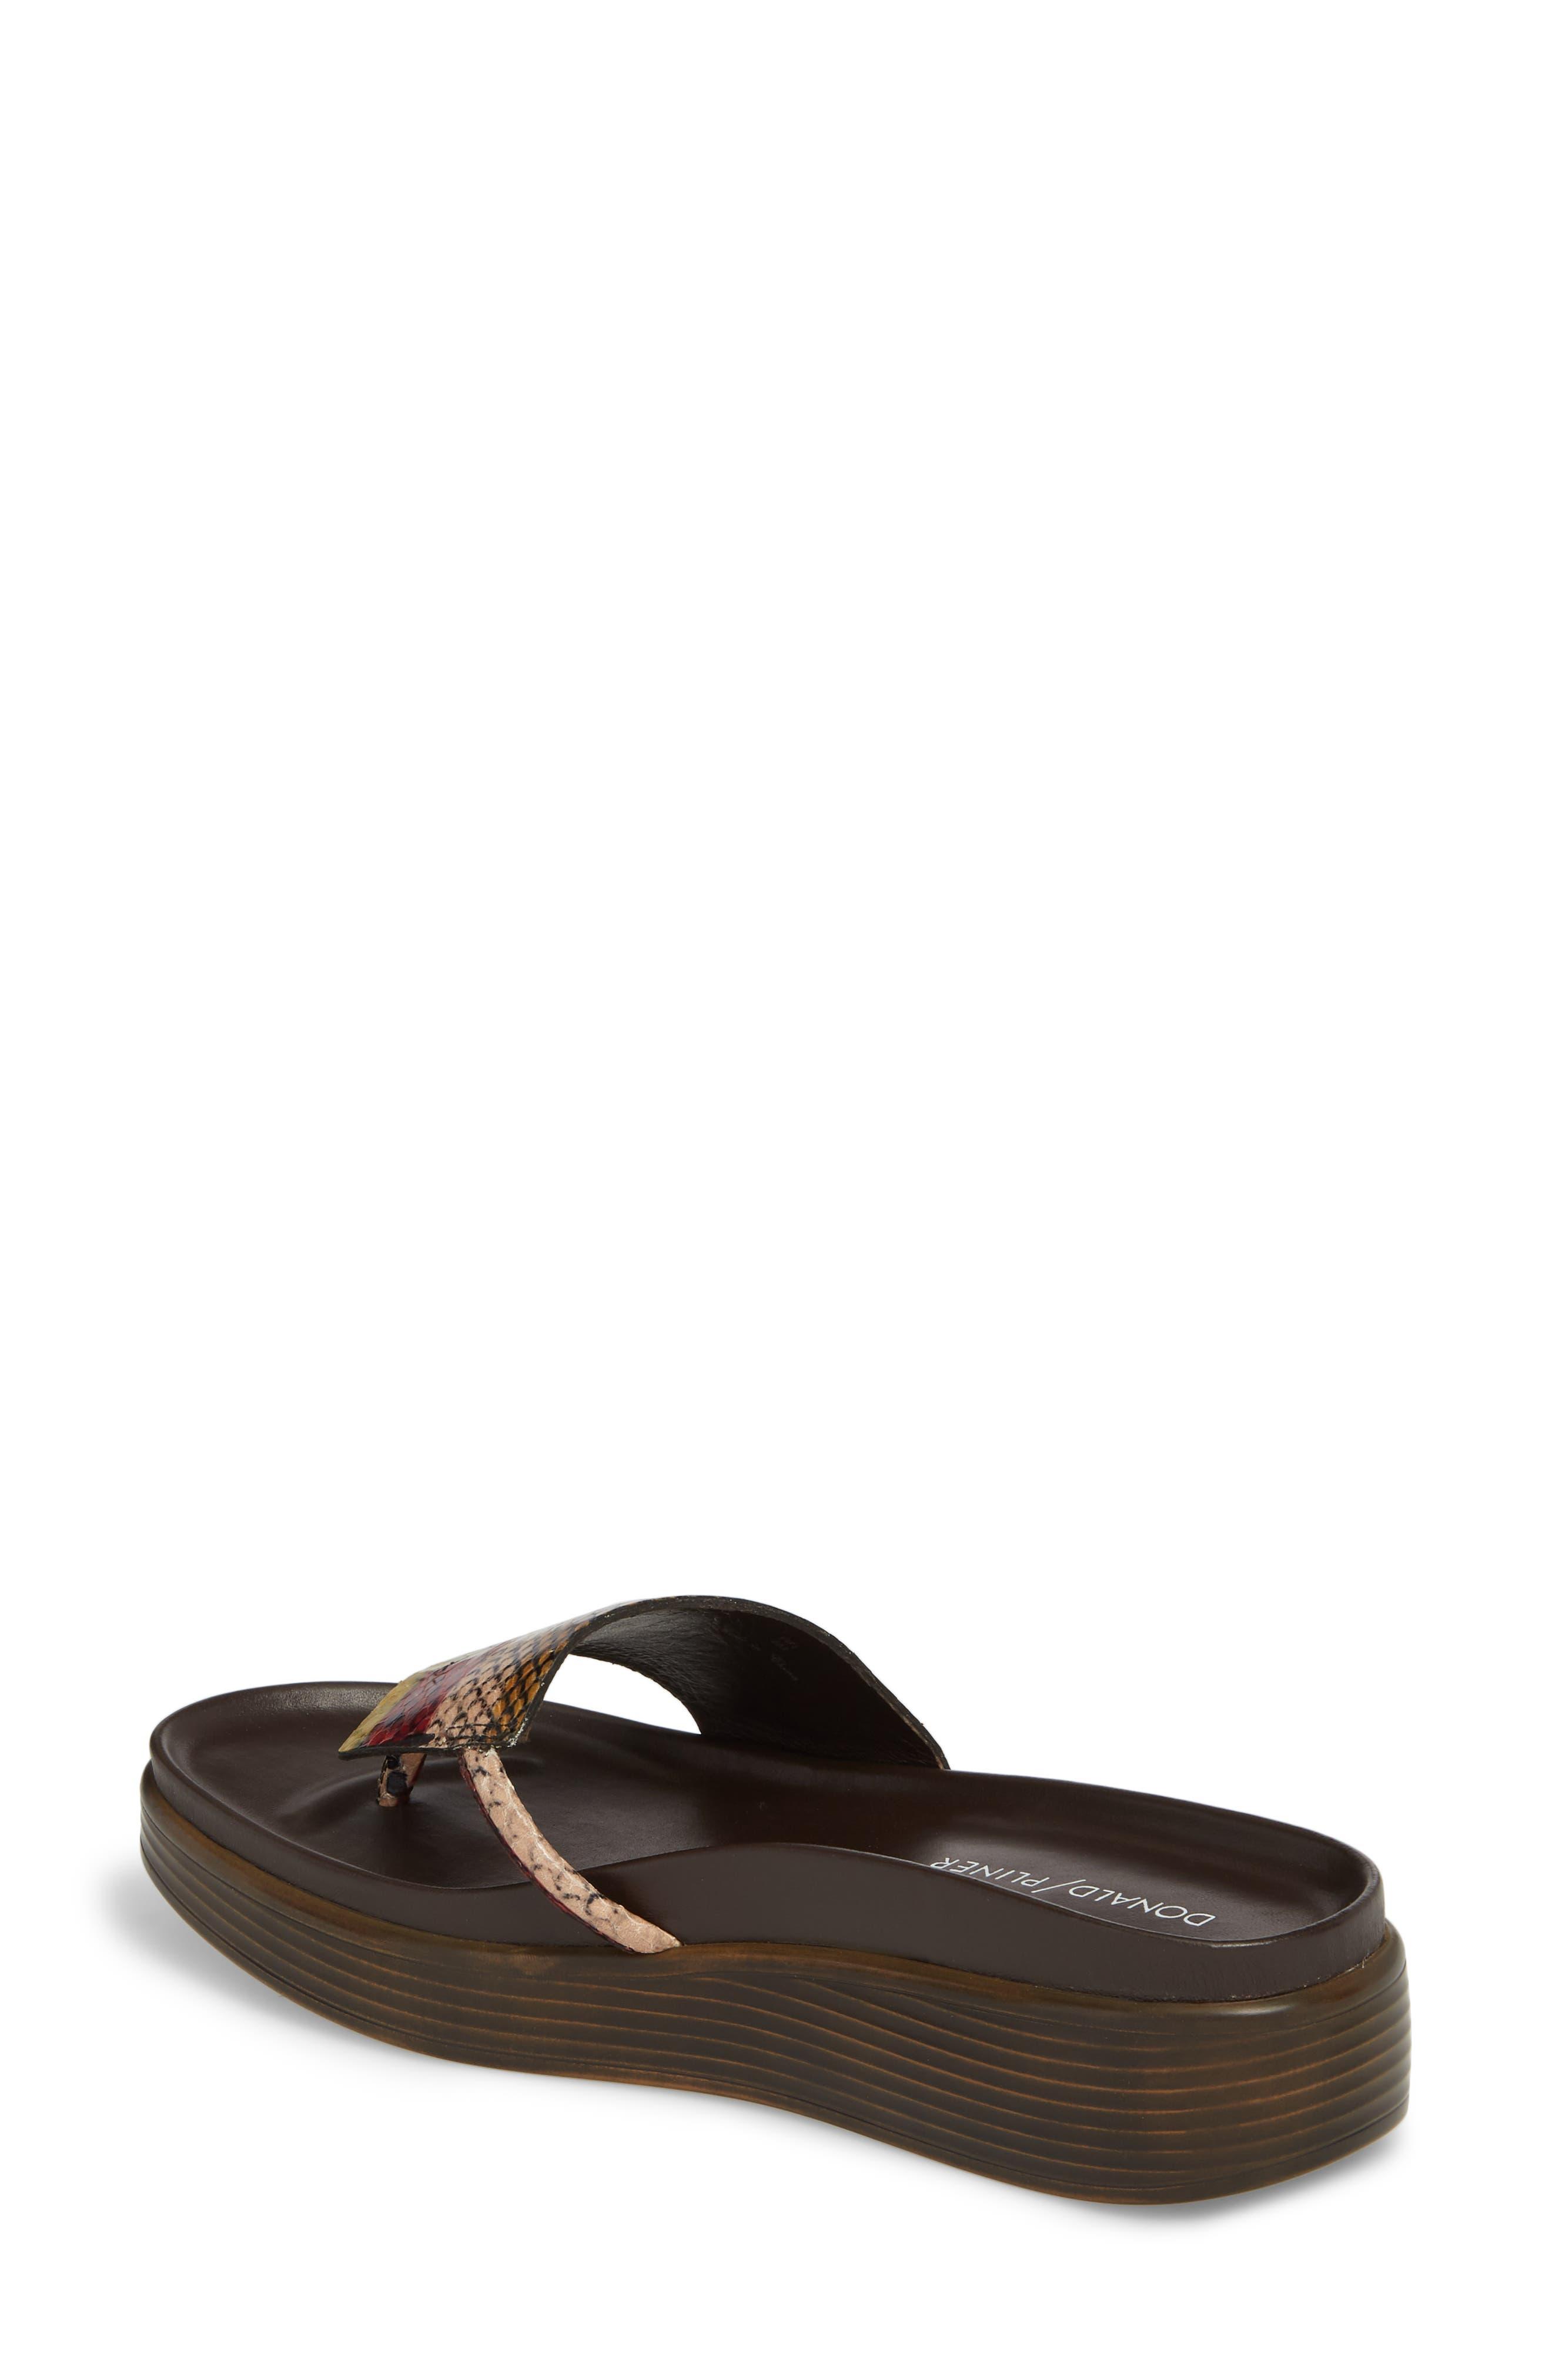 Fifi Slide Sandal,                             Alternate thumbnail 2, color,                             Fawn Leather